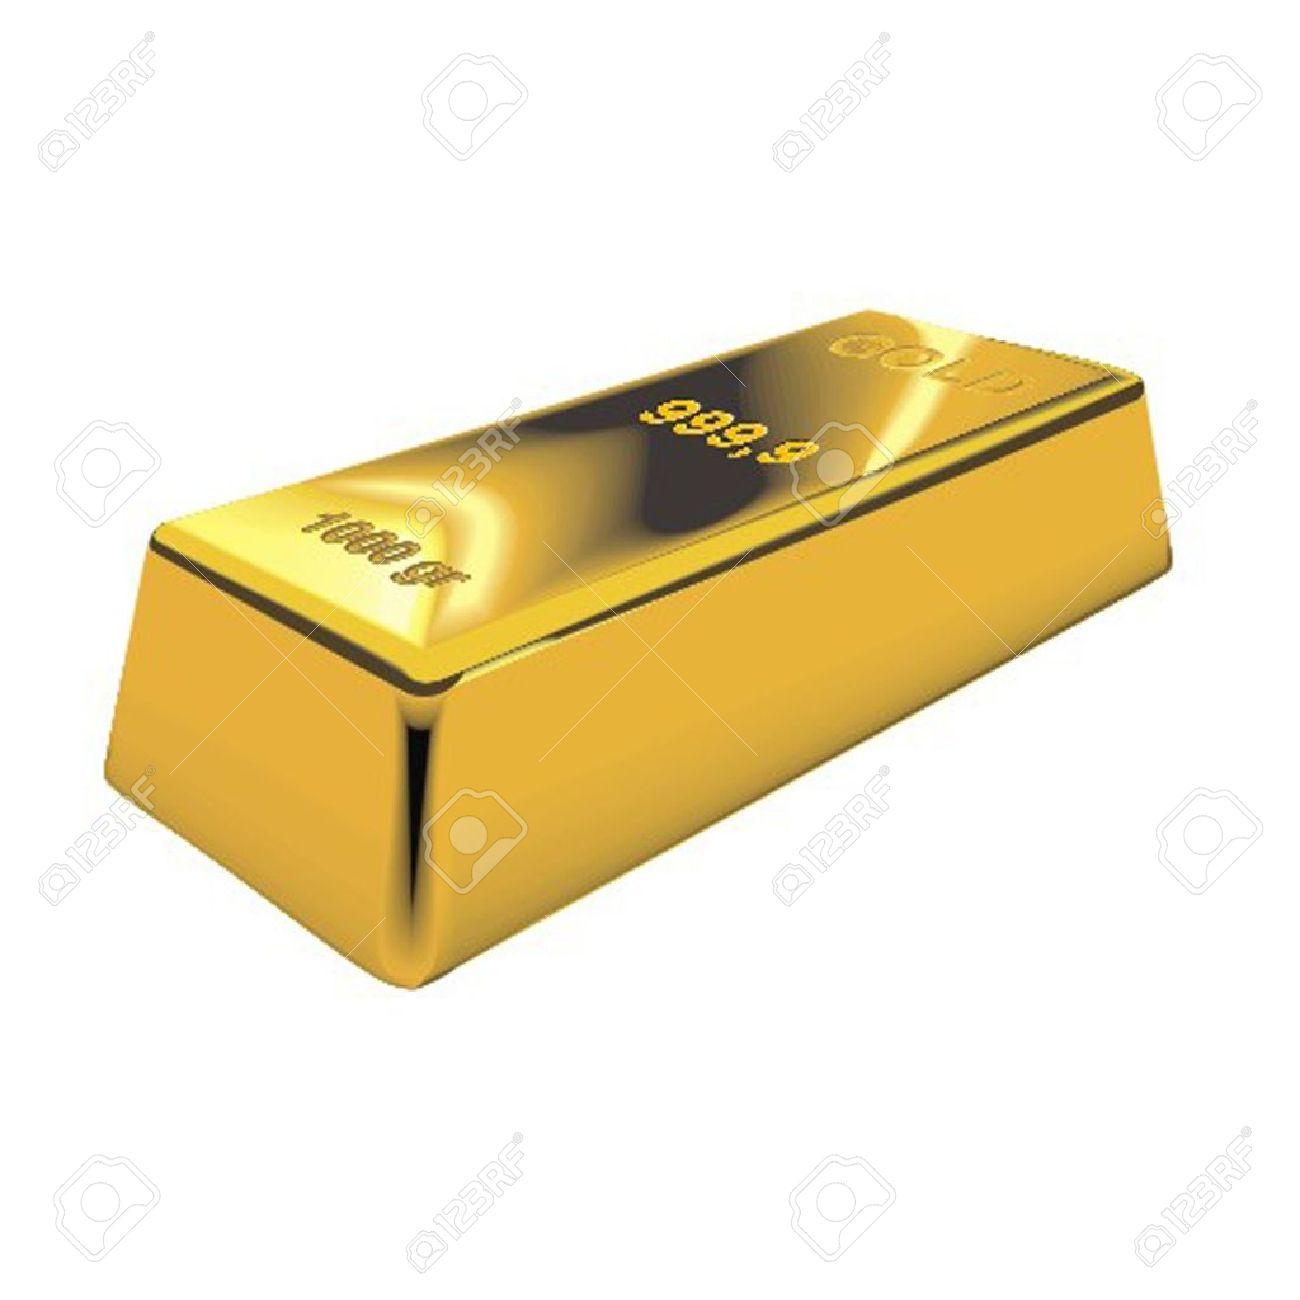 Gold Bar Clipart Free